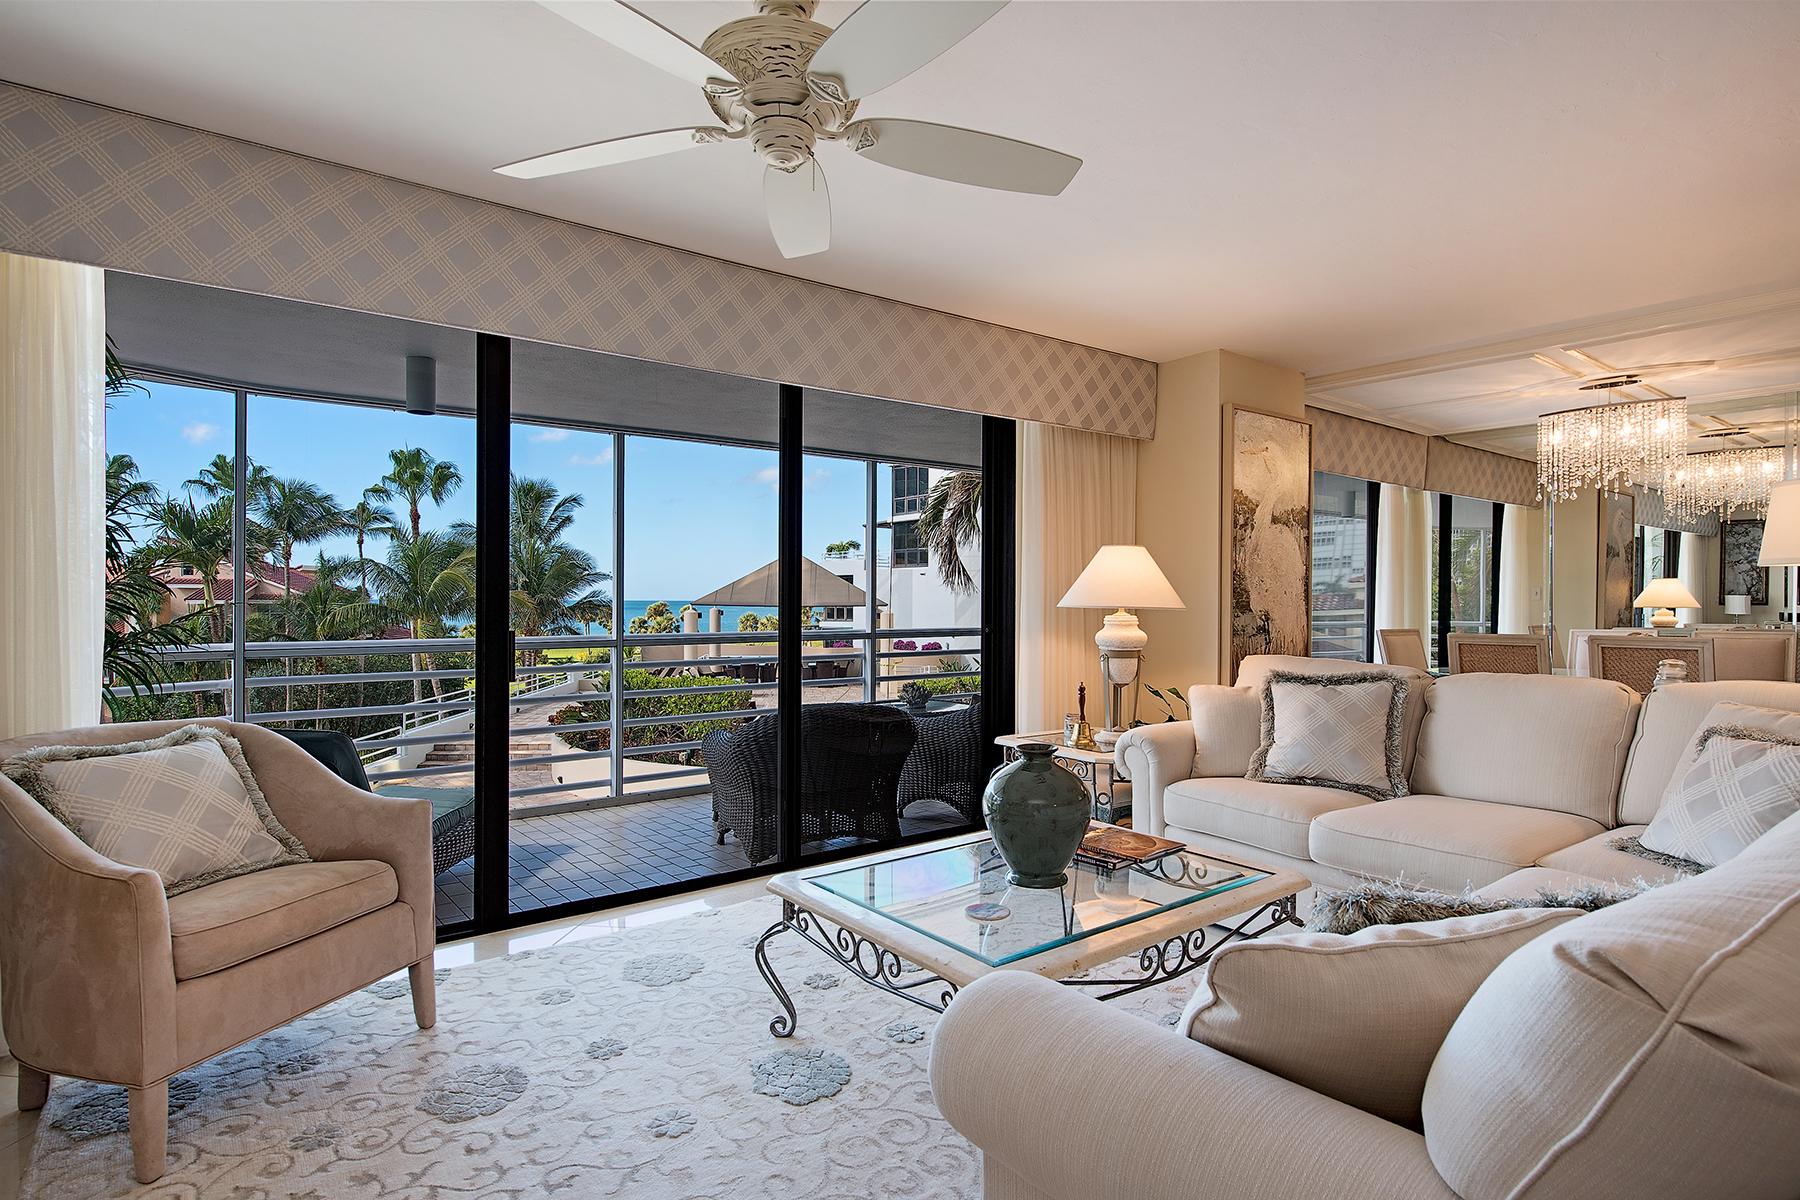 Condominium for Sale at TERRACES AT PARK SHORE 4751 Gulf Shore Blvd N 406, Naples, Florida 34103 United States